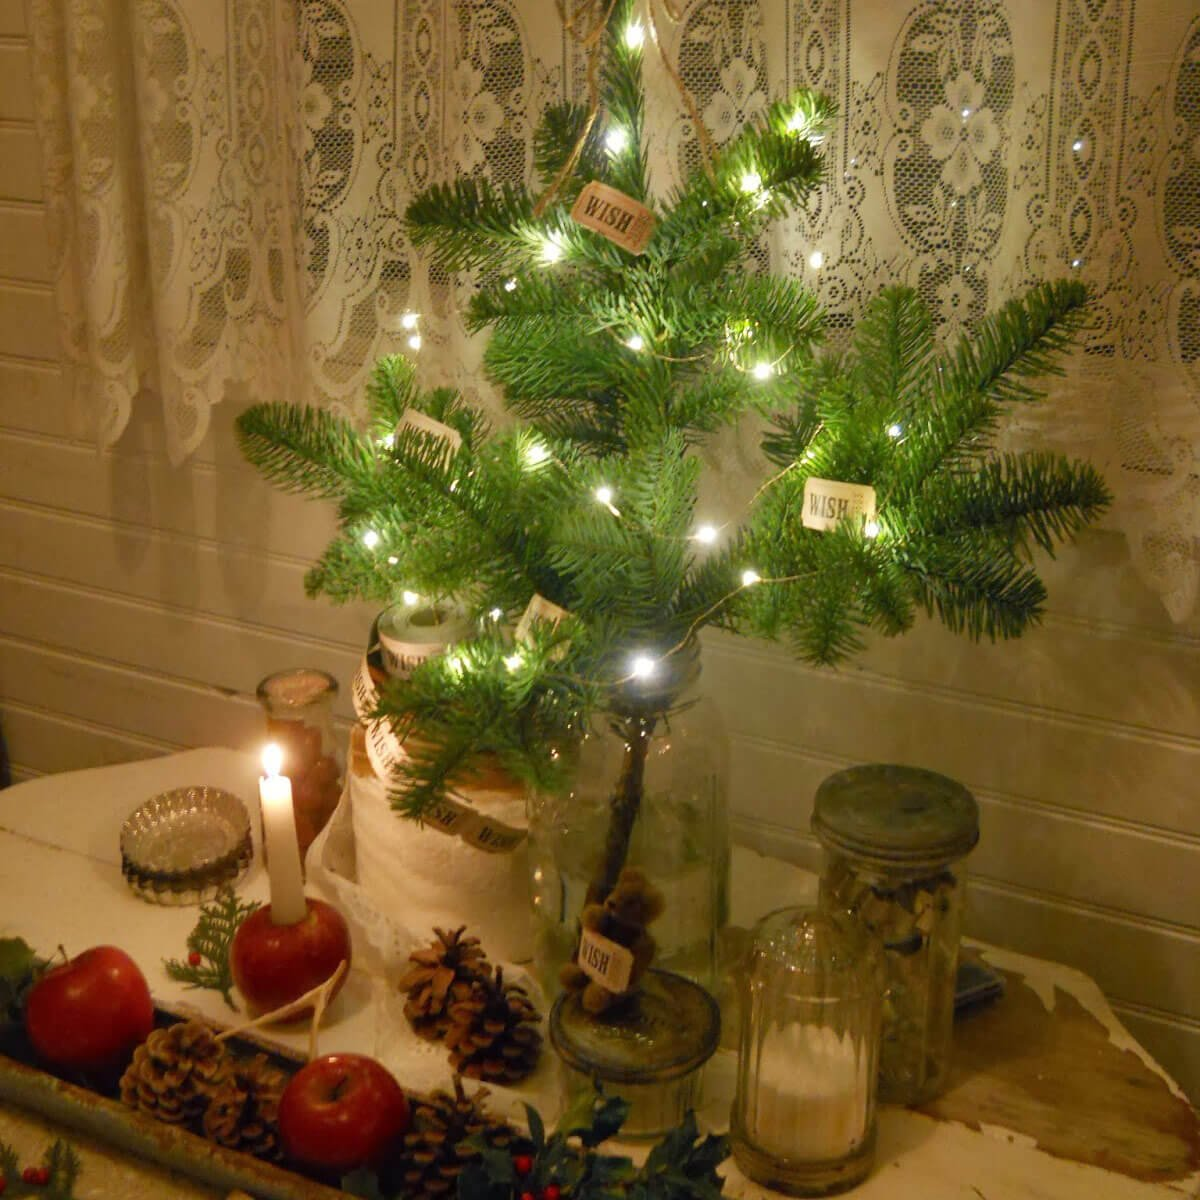 decorazioni-natalizie-shabby-chic-18